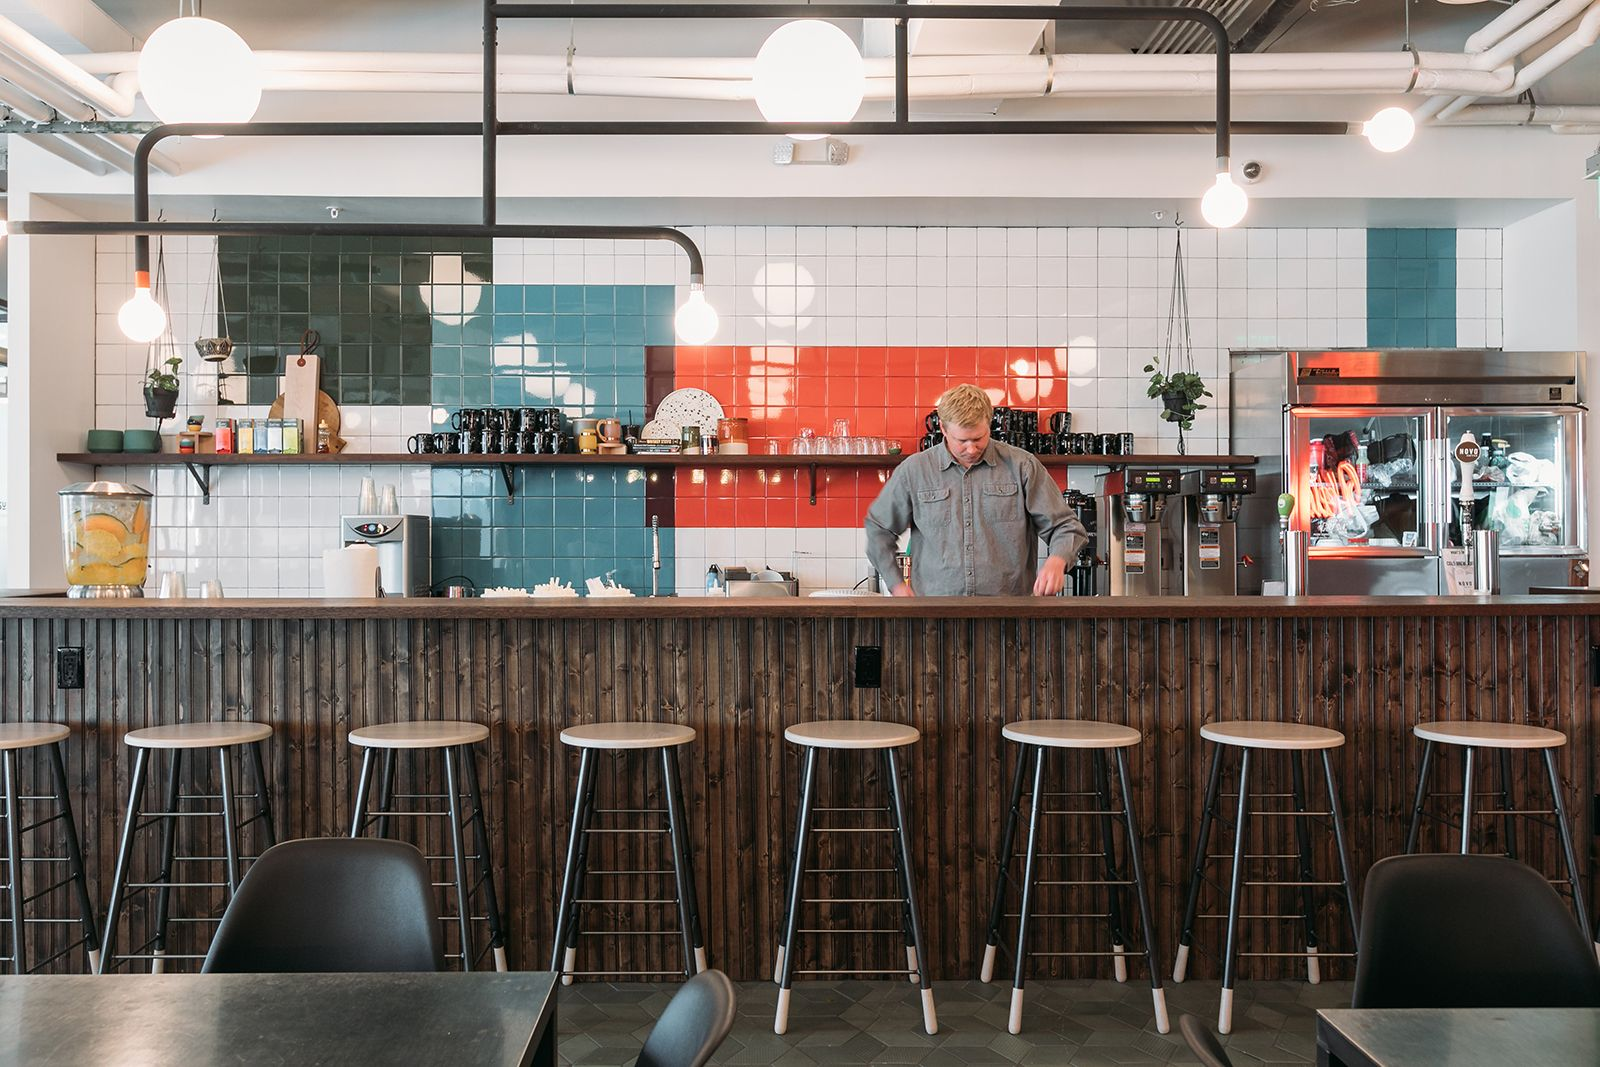 Kitchen Stores Denver Outdoor Grill A Tour Of Wework Lohi Paulista Pinterest